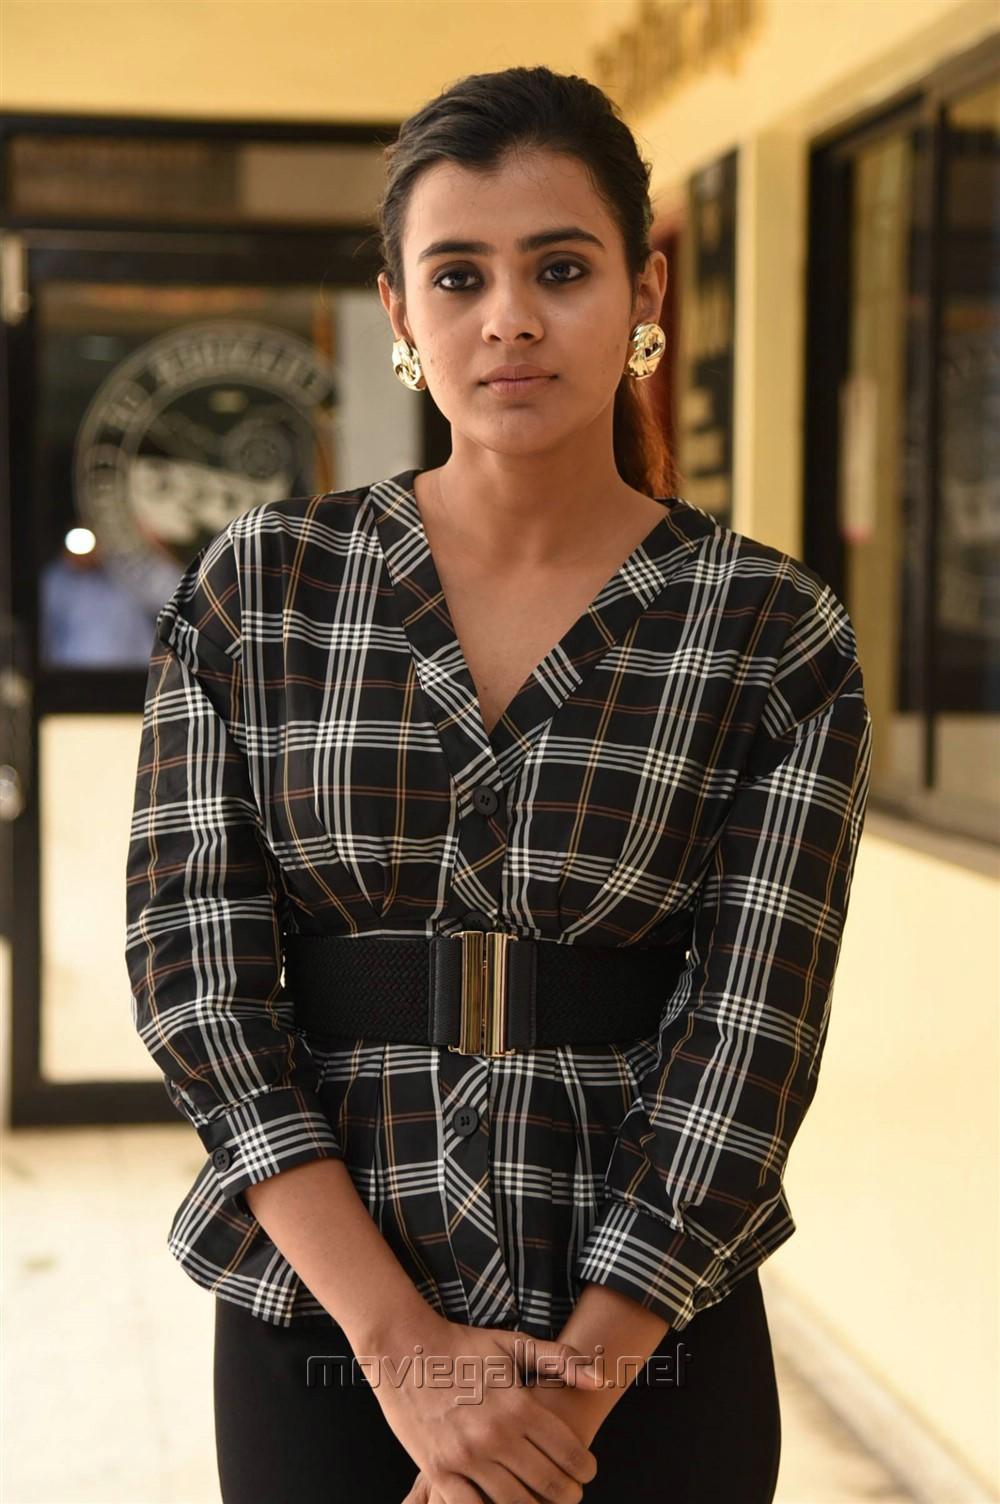 24 Kisses Actress Heebah Patel Photos in Retro Style Dress